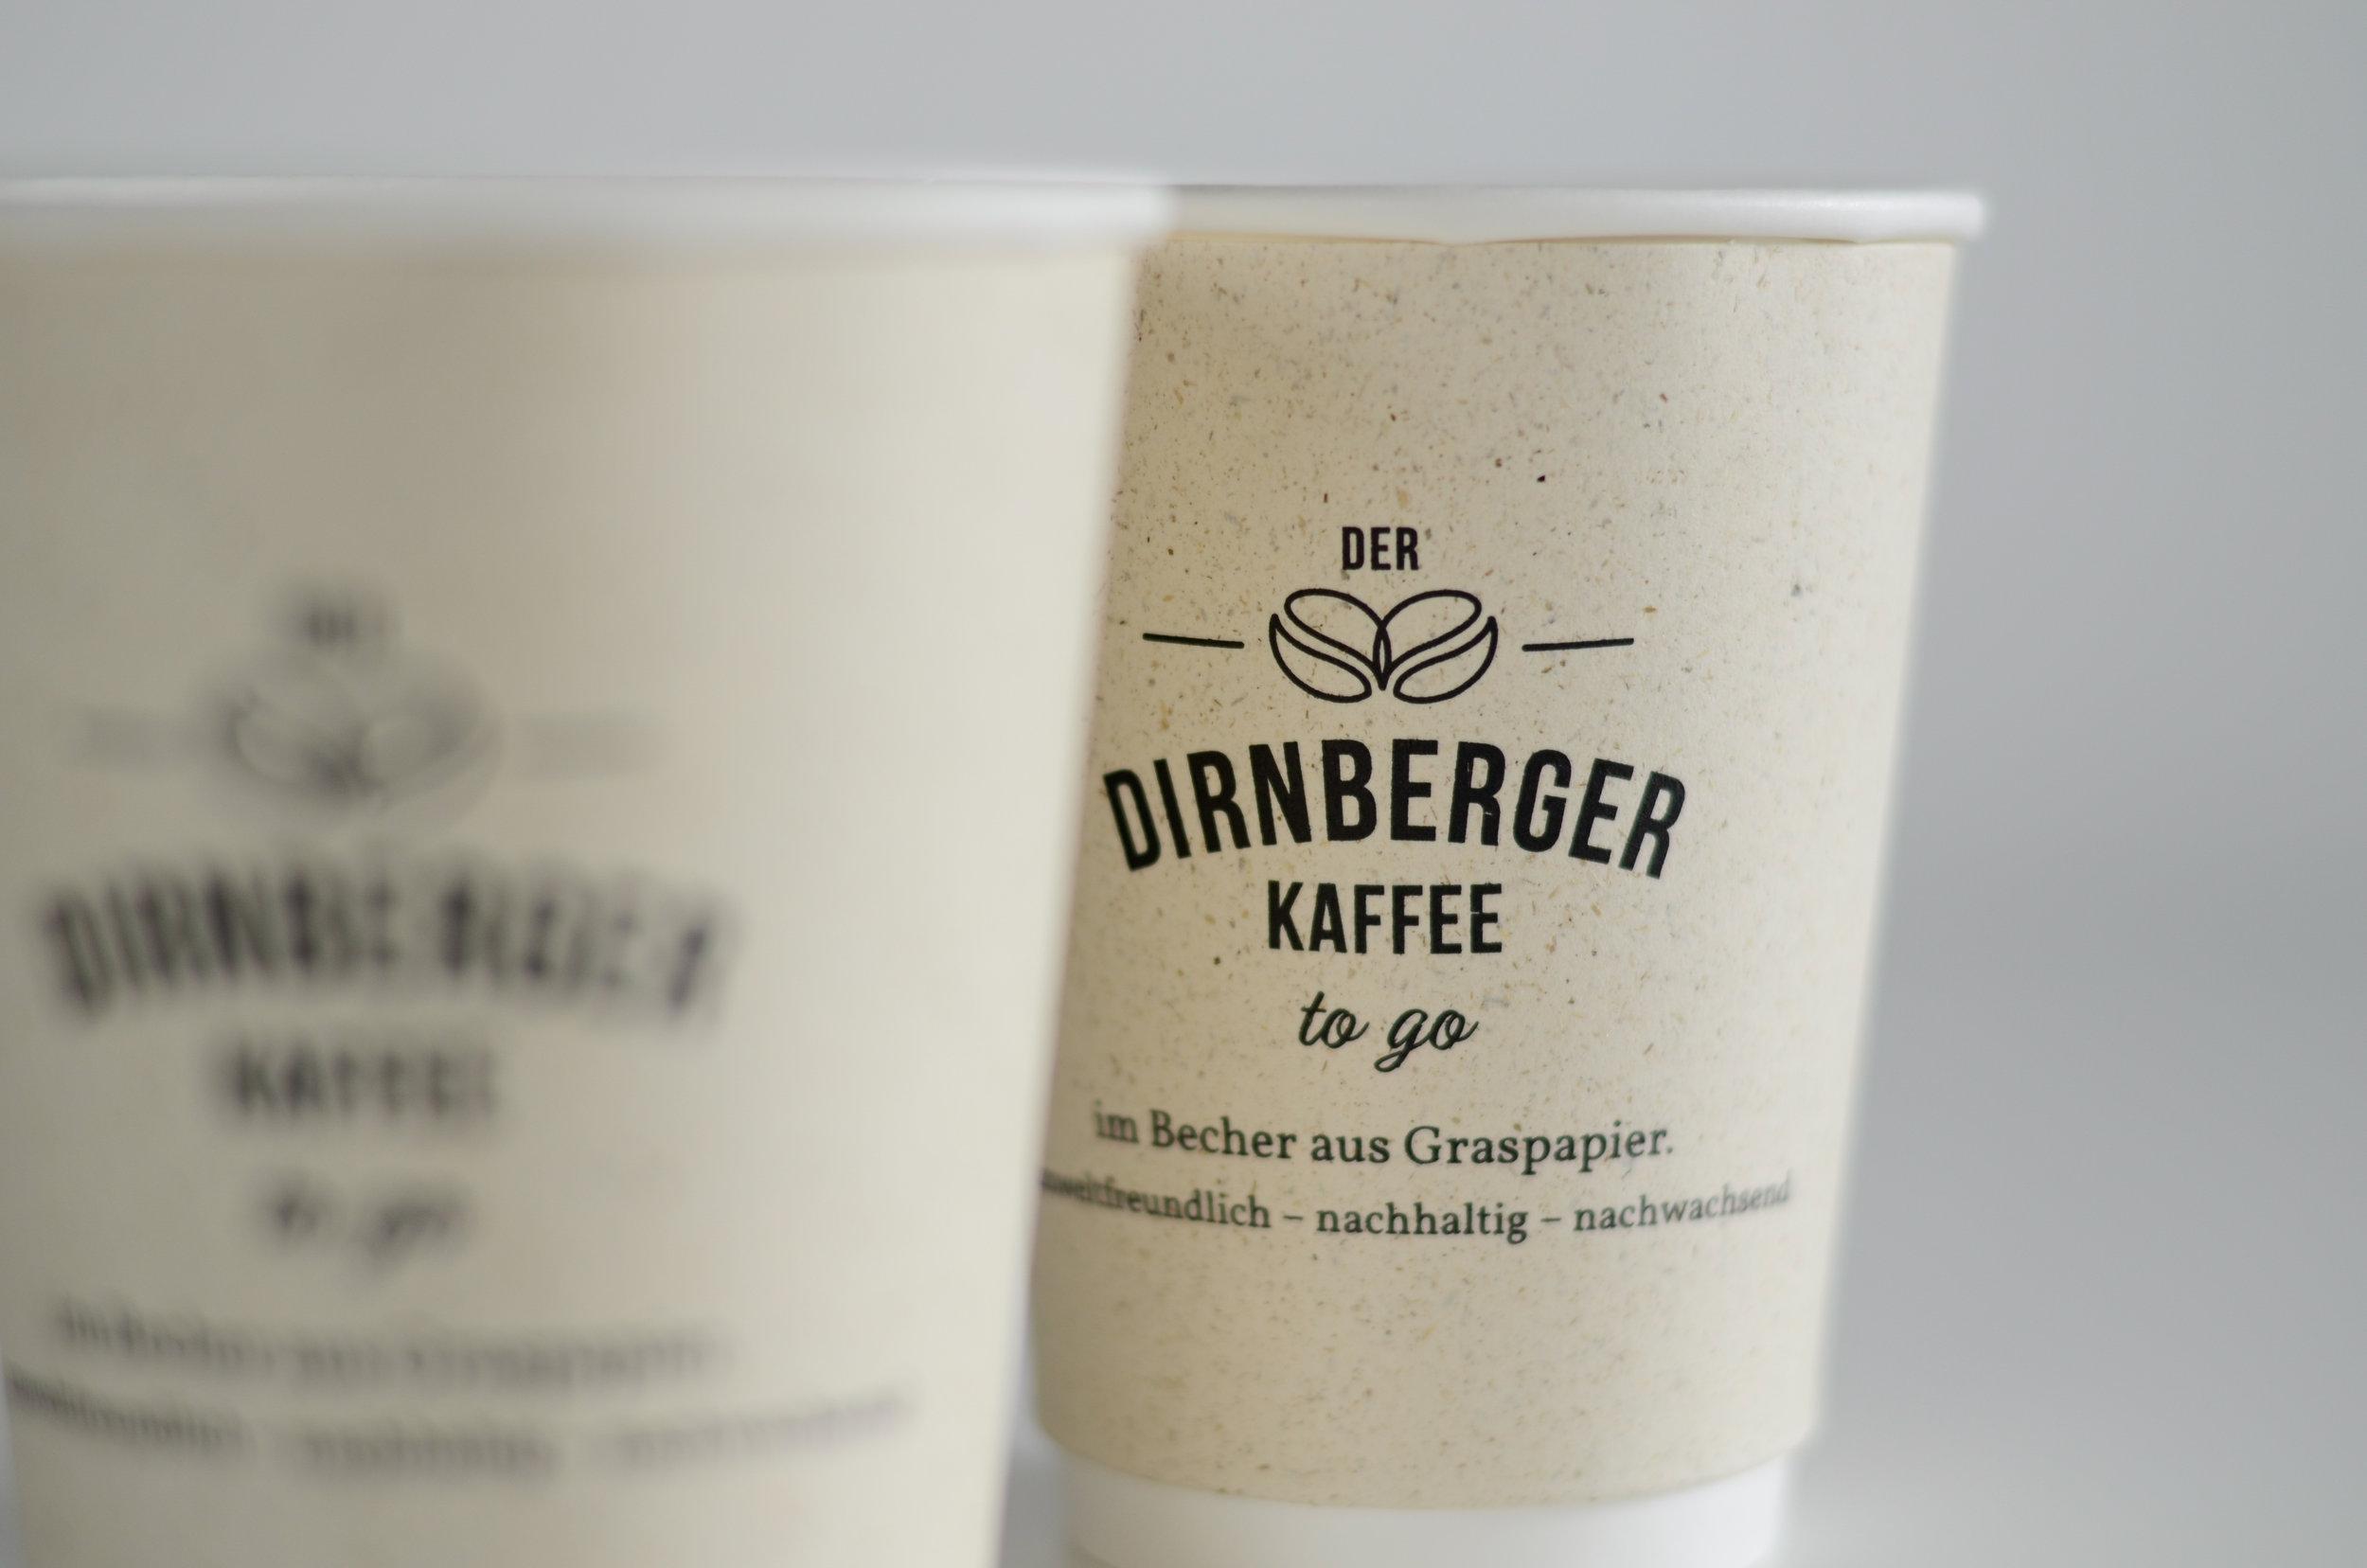 Foto: WEBER Packaging GmbH für ©  EDEKA Dirnberger , 2019